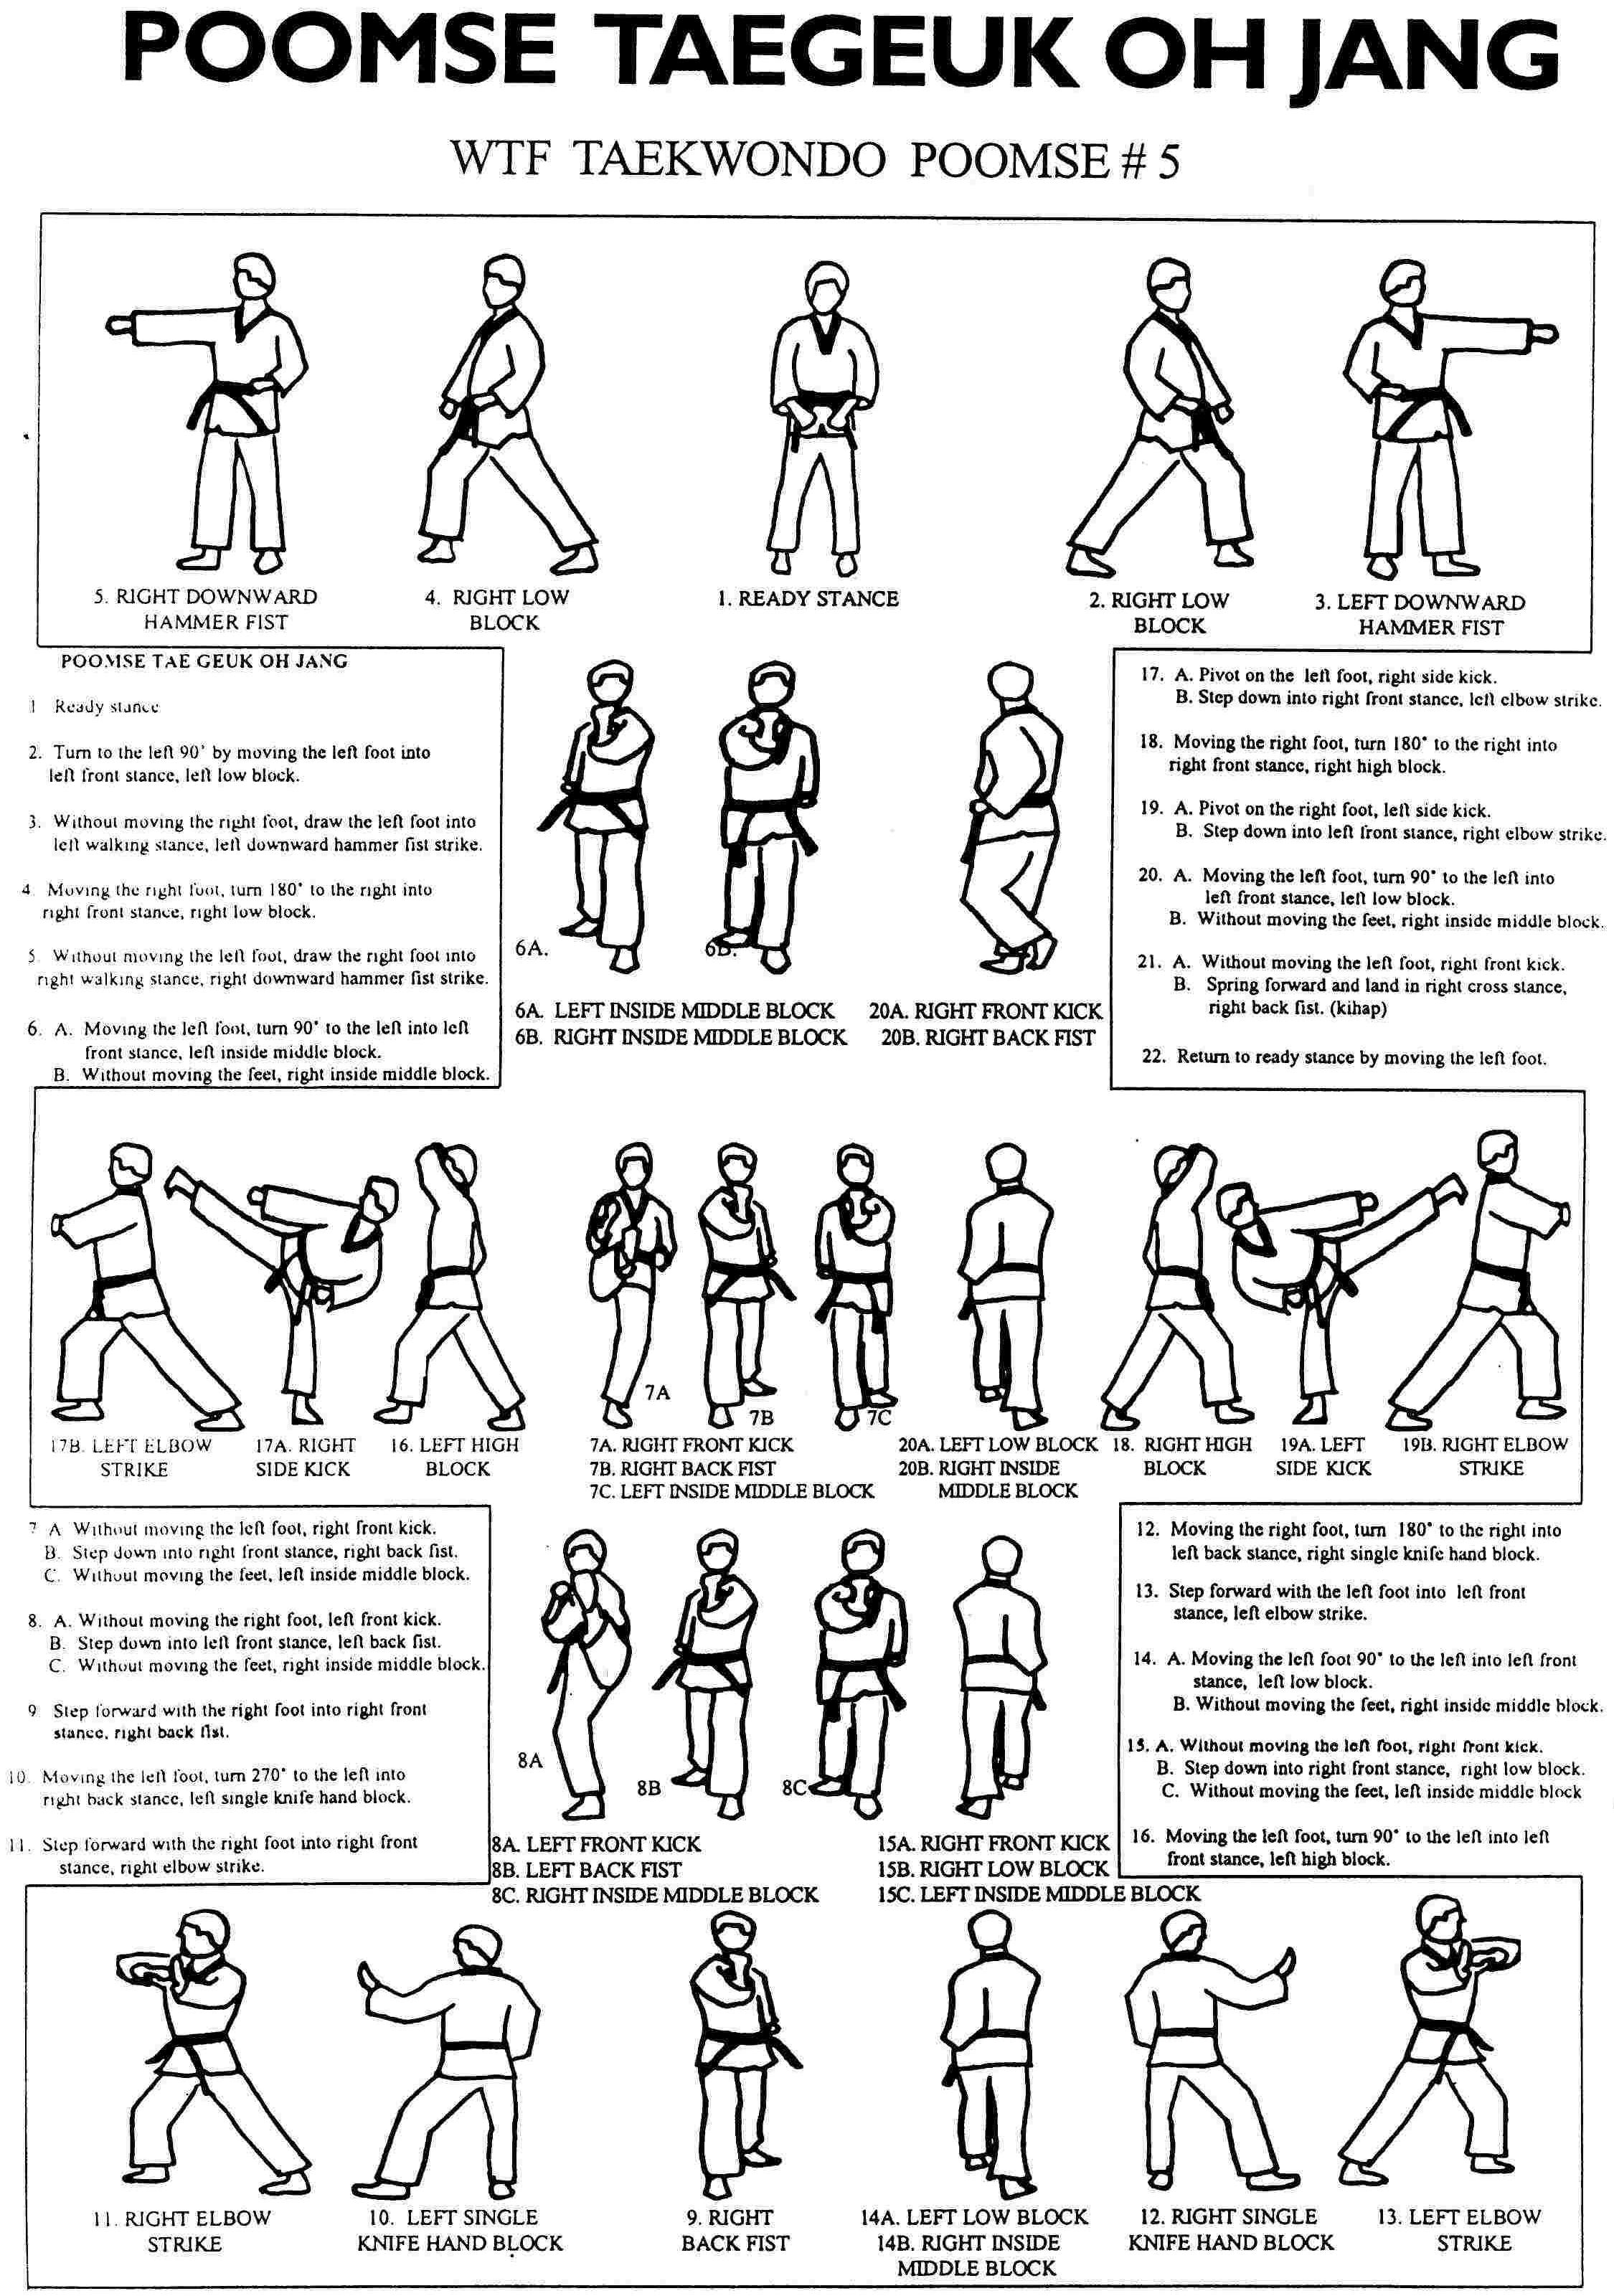 Taegeuk Oh Jang Taekwondo Wiki Fandom Powered By Wikia Block Diagram Wikipedia Taegeuk05